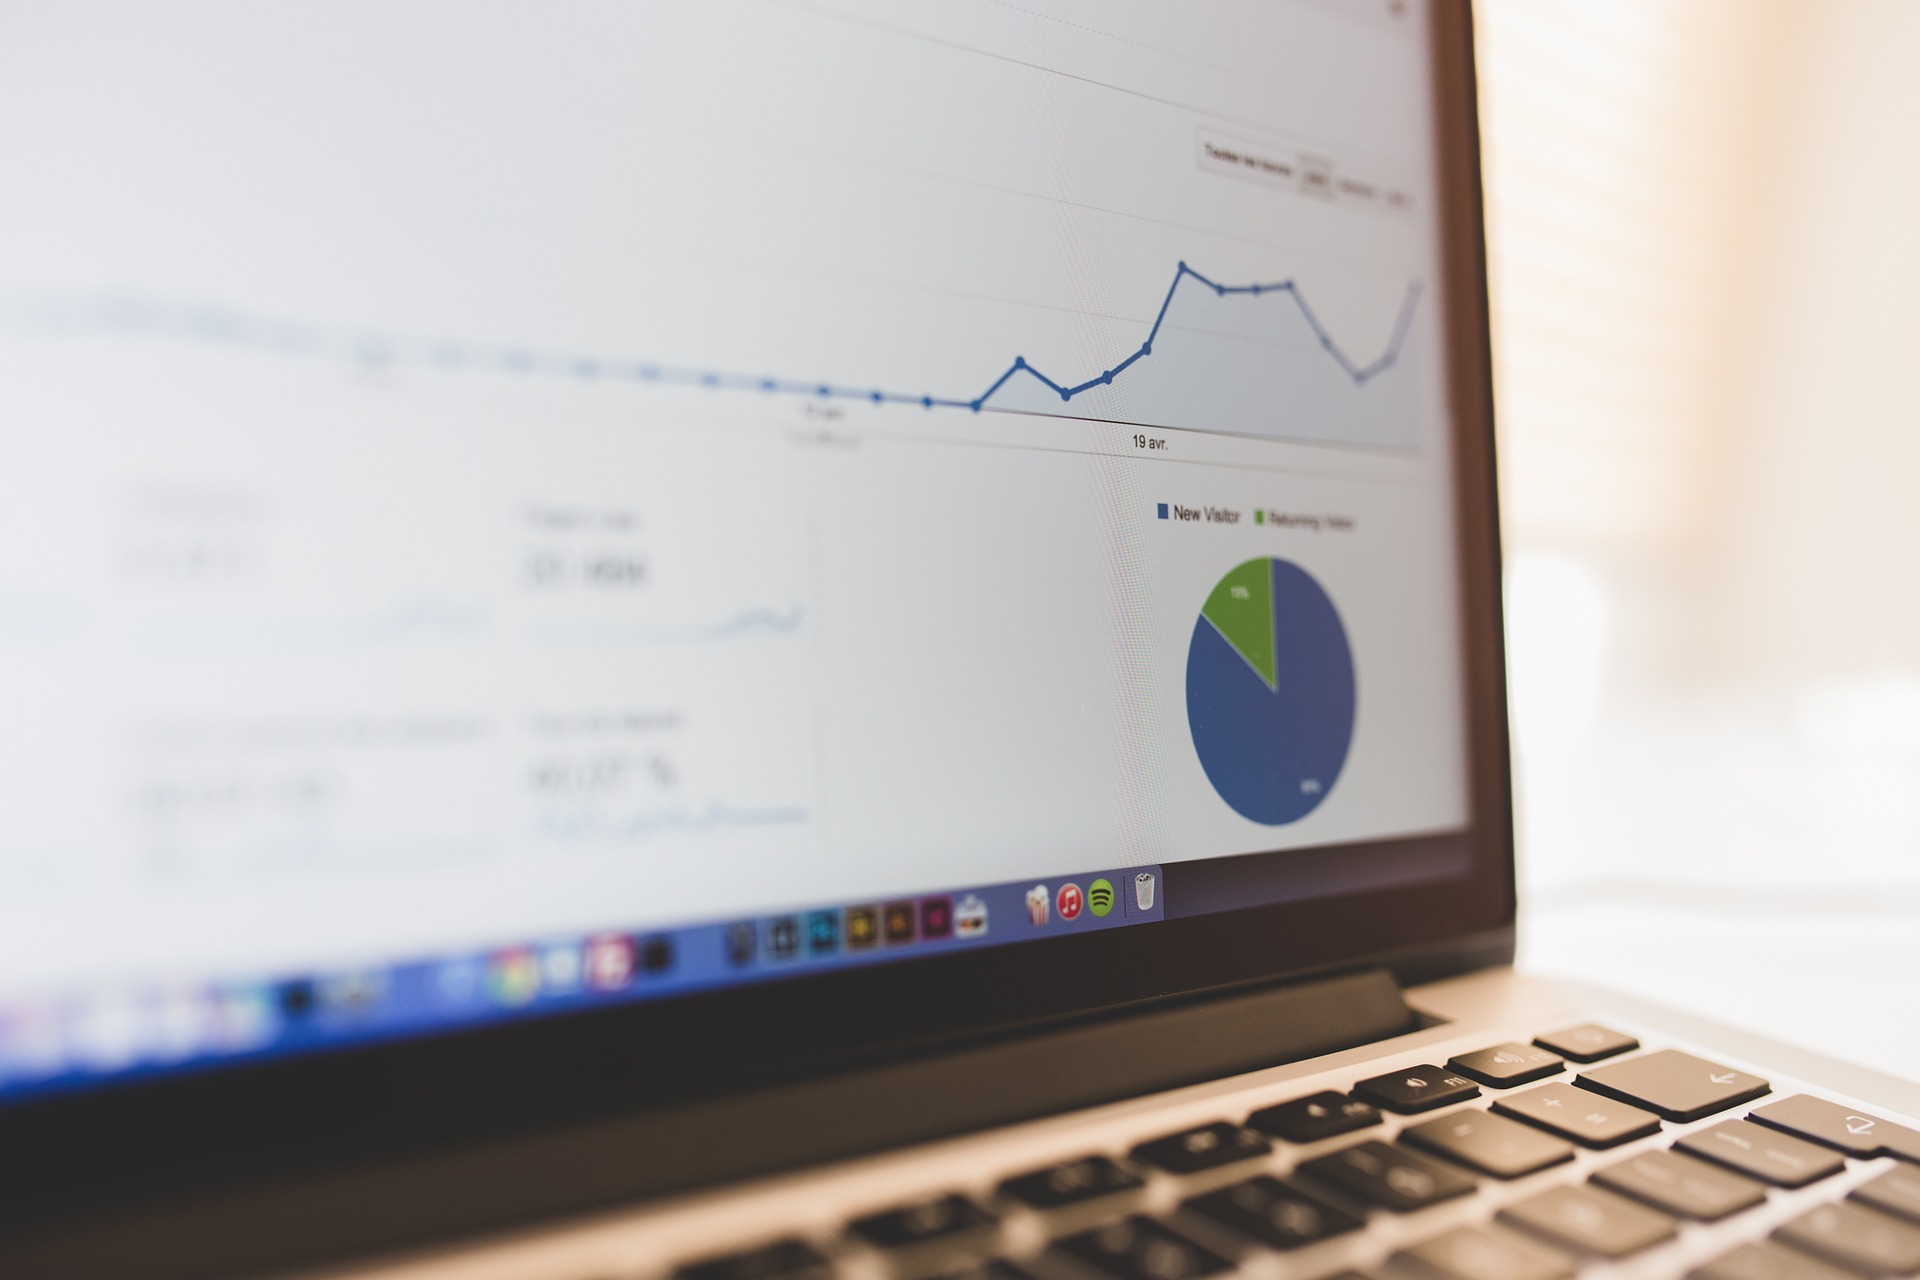 agencia marketing digital, seo, posicionamiento buscadores, computador oficina, metrícas